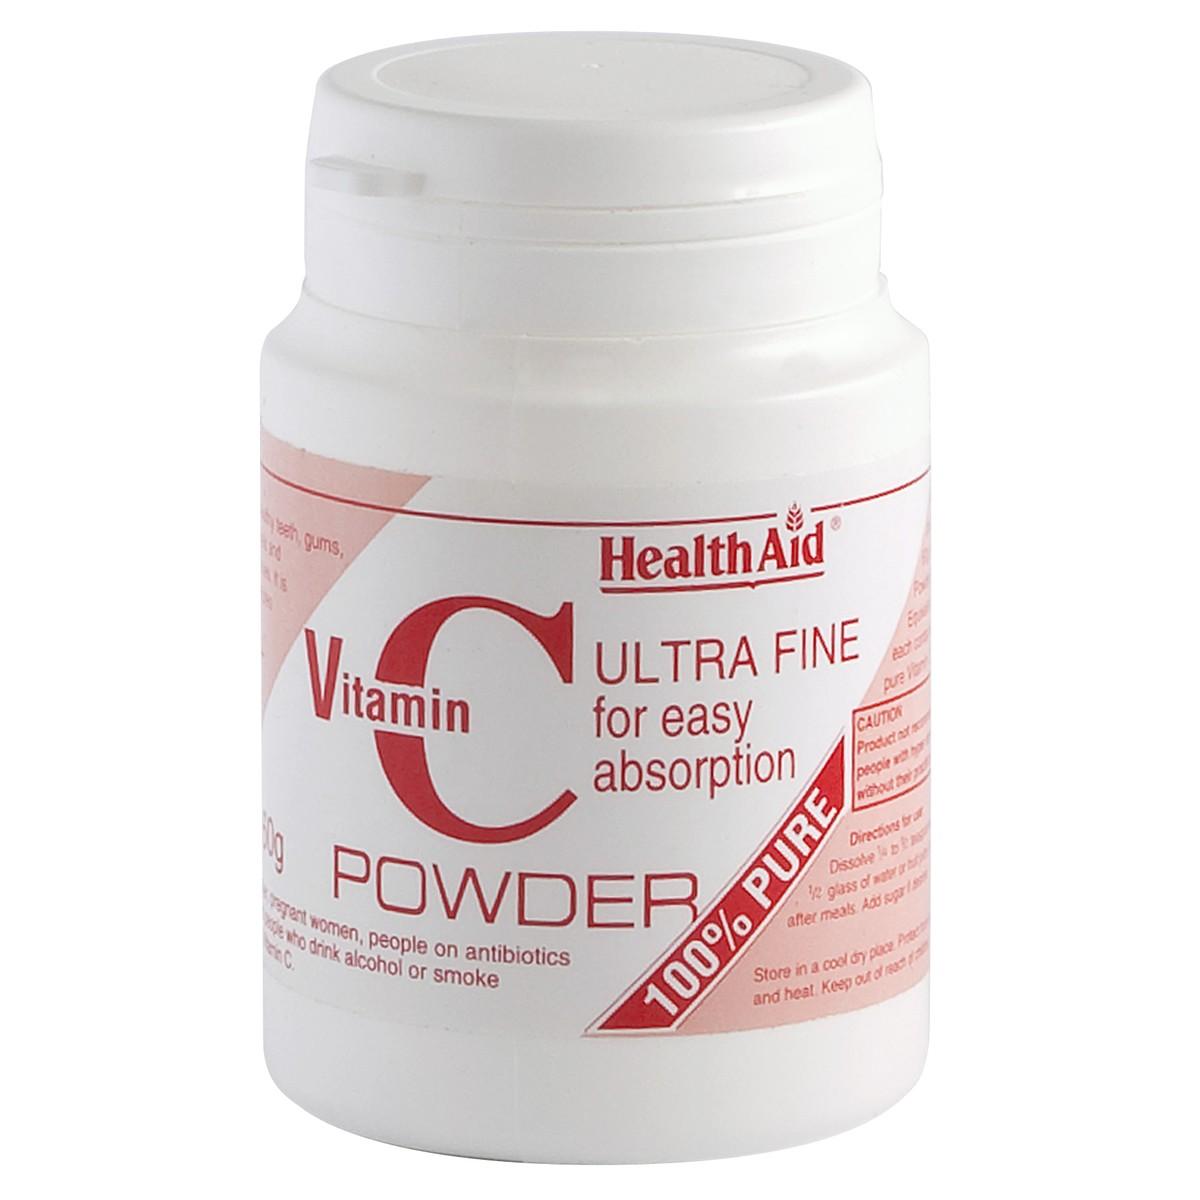 HealthAid Vitamin C 100% Pure Ultrafine Powder